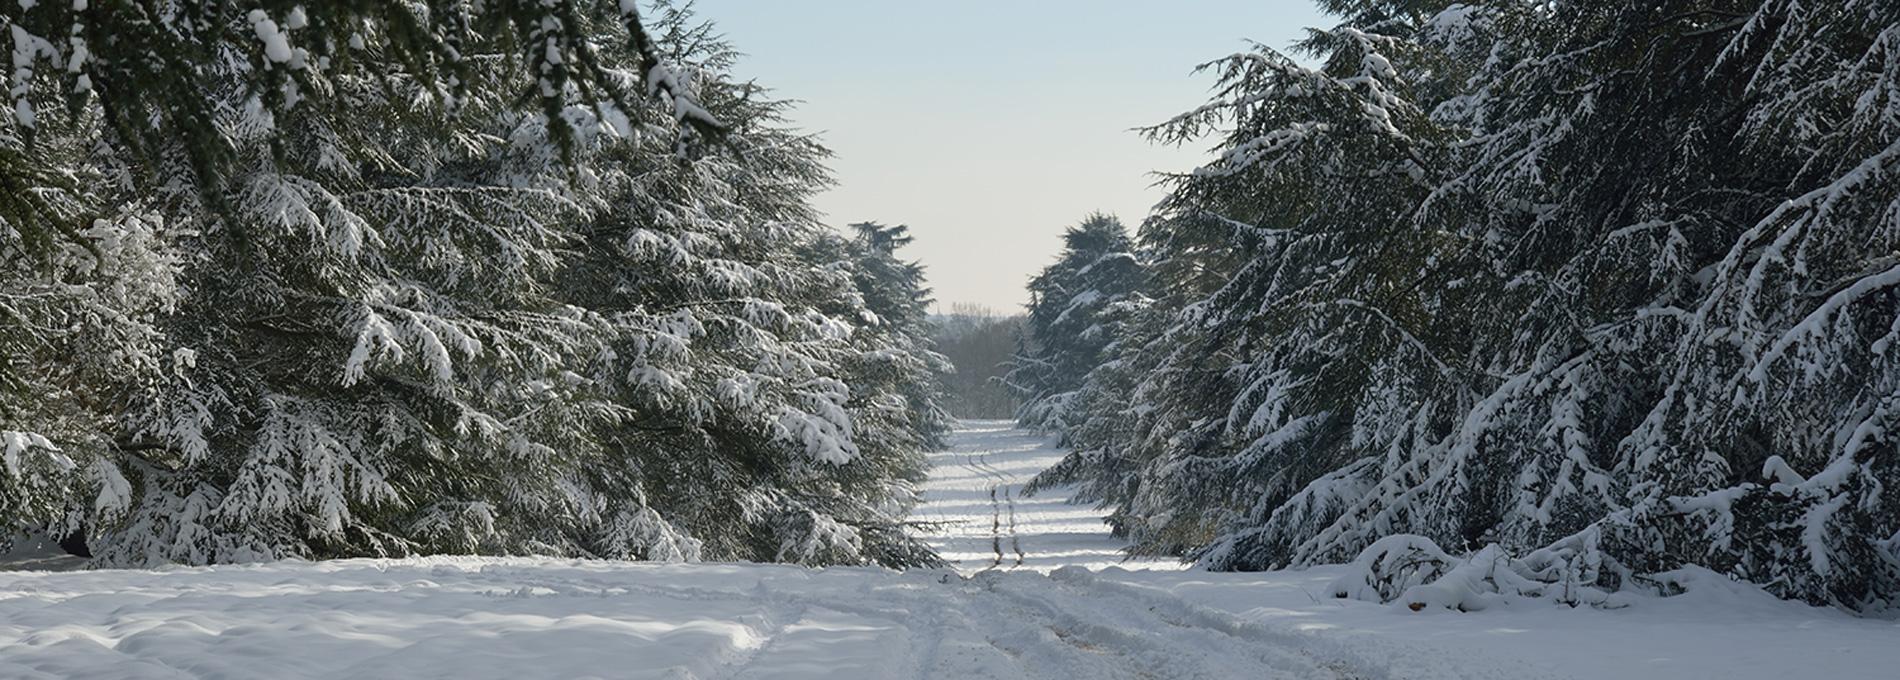 Allée des Cèdres bleus de l'Atlas en hiver © MNHN - S. Gerbault